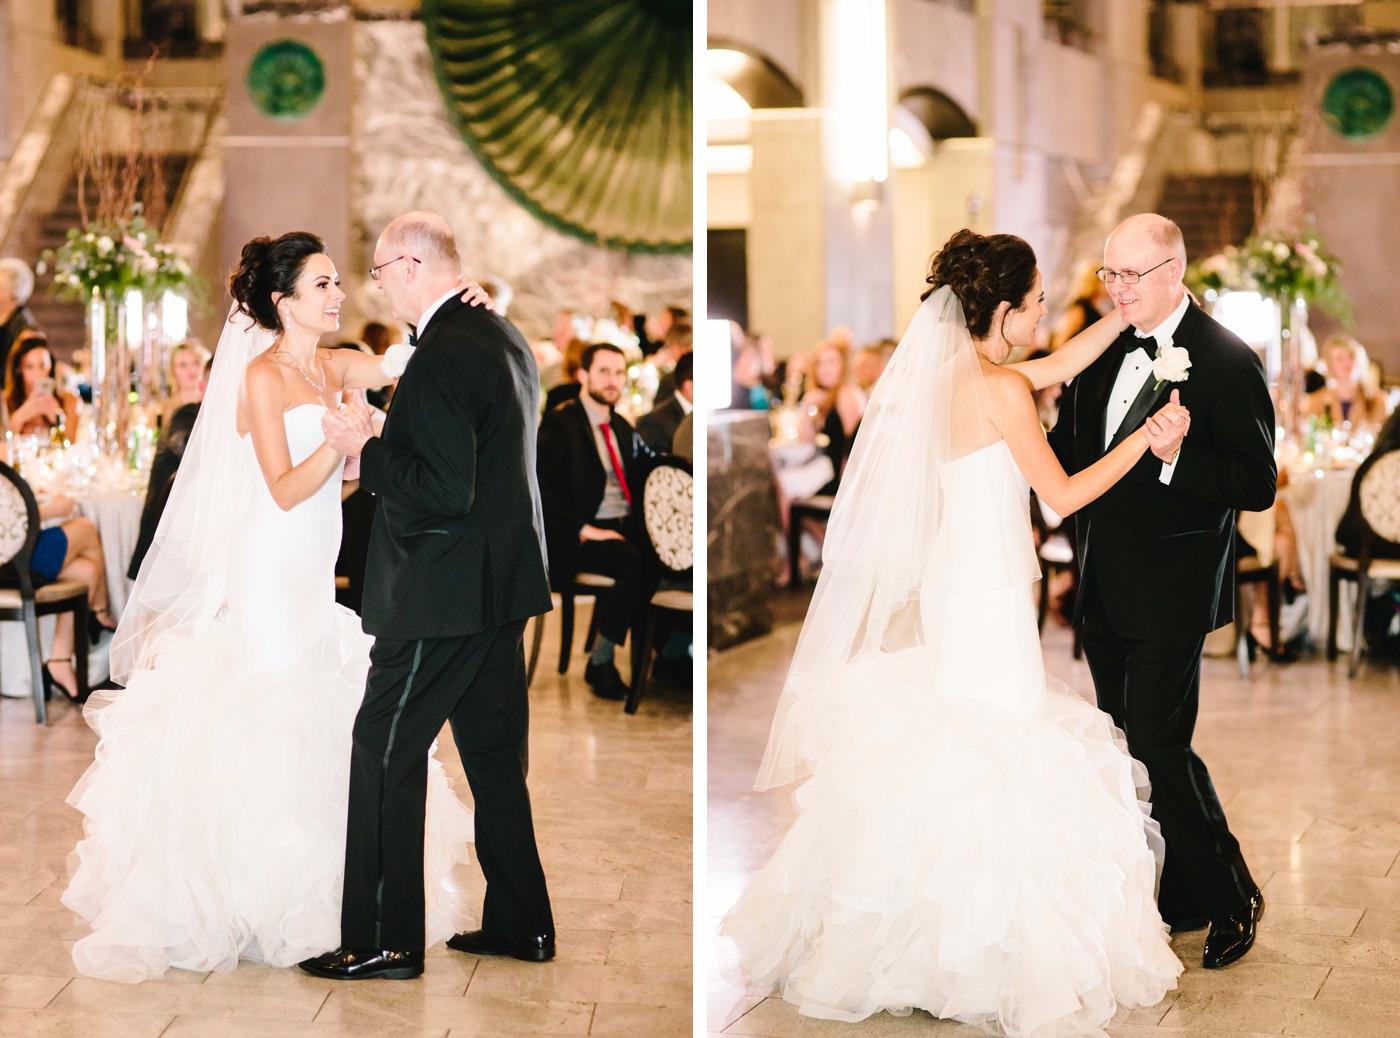 chicago-fine-art-wedding-photography-hamm68